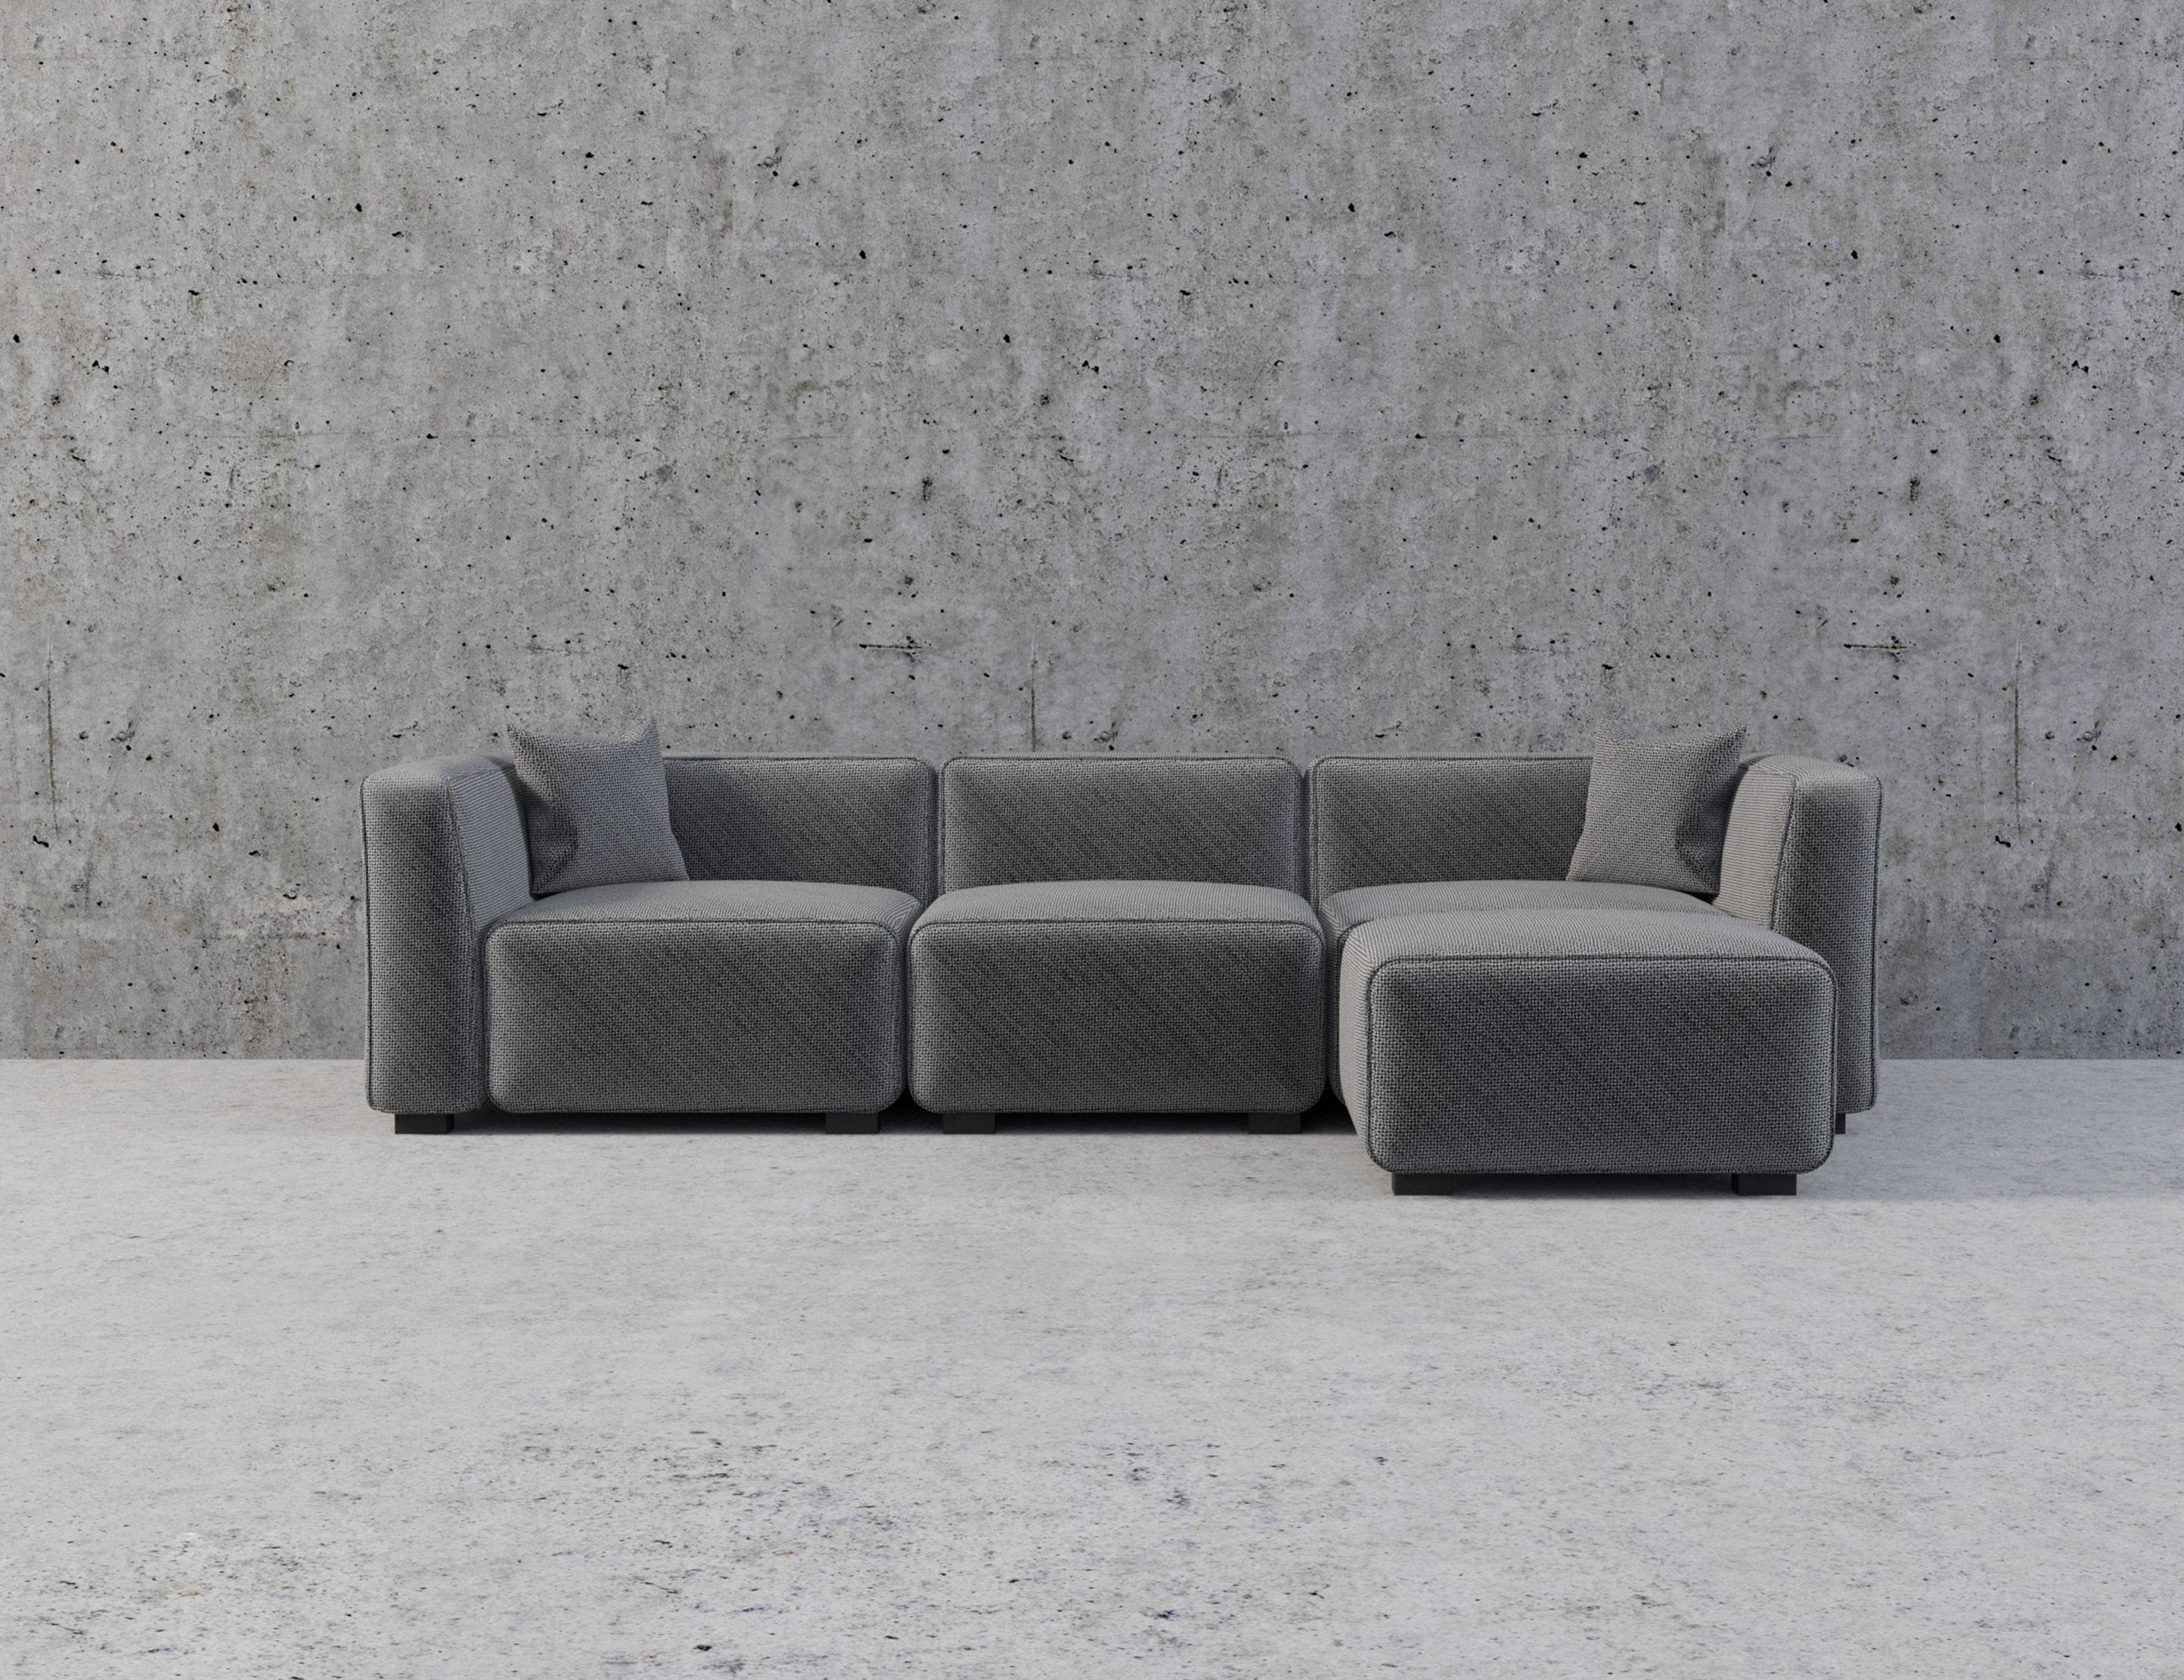 Soft Cube Modern Modular Sofa Set Expand Furniture Folding Tables Smarter Wall Beds Space Savers